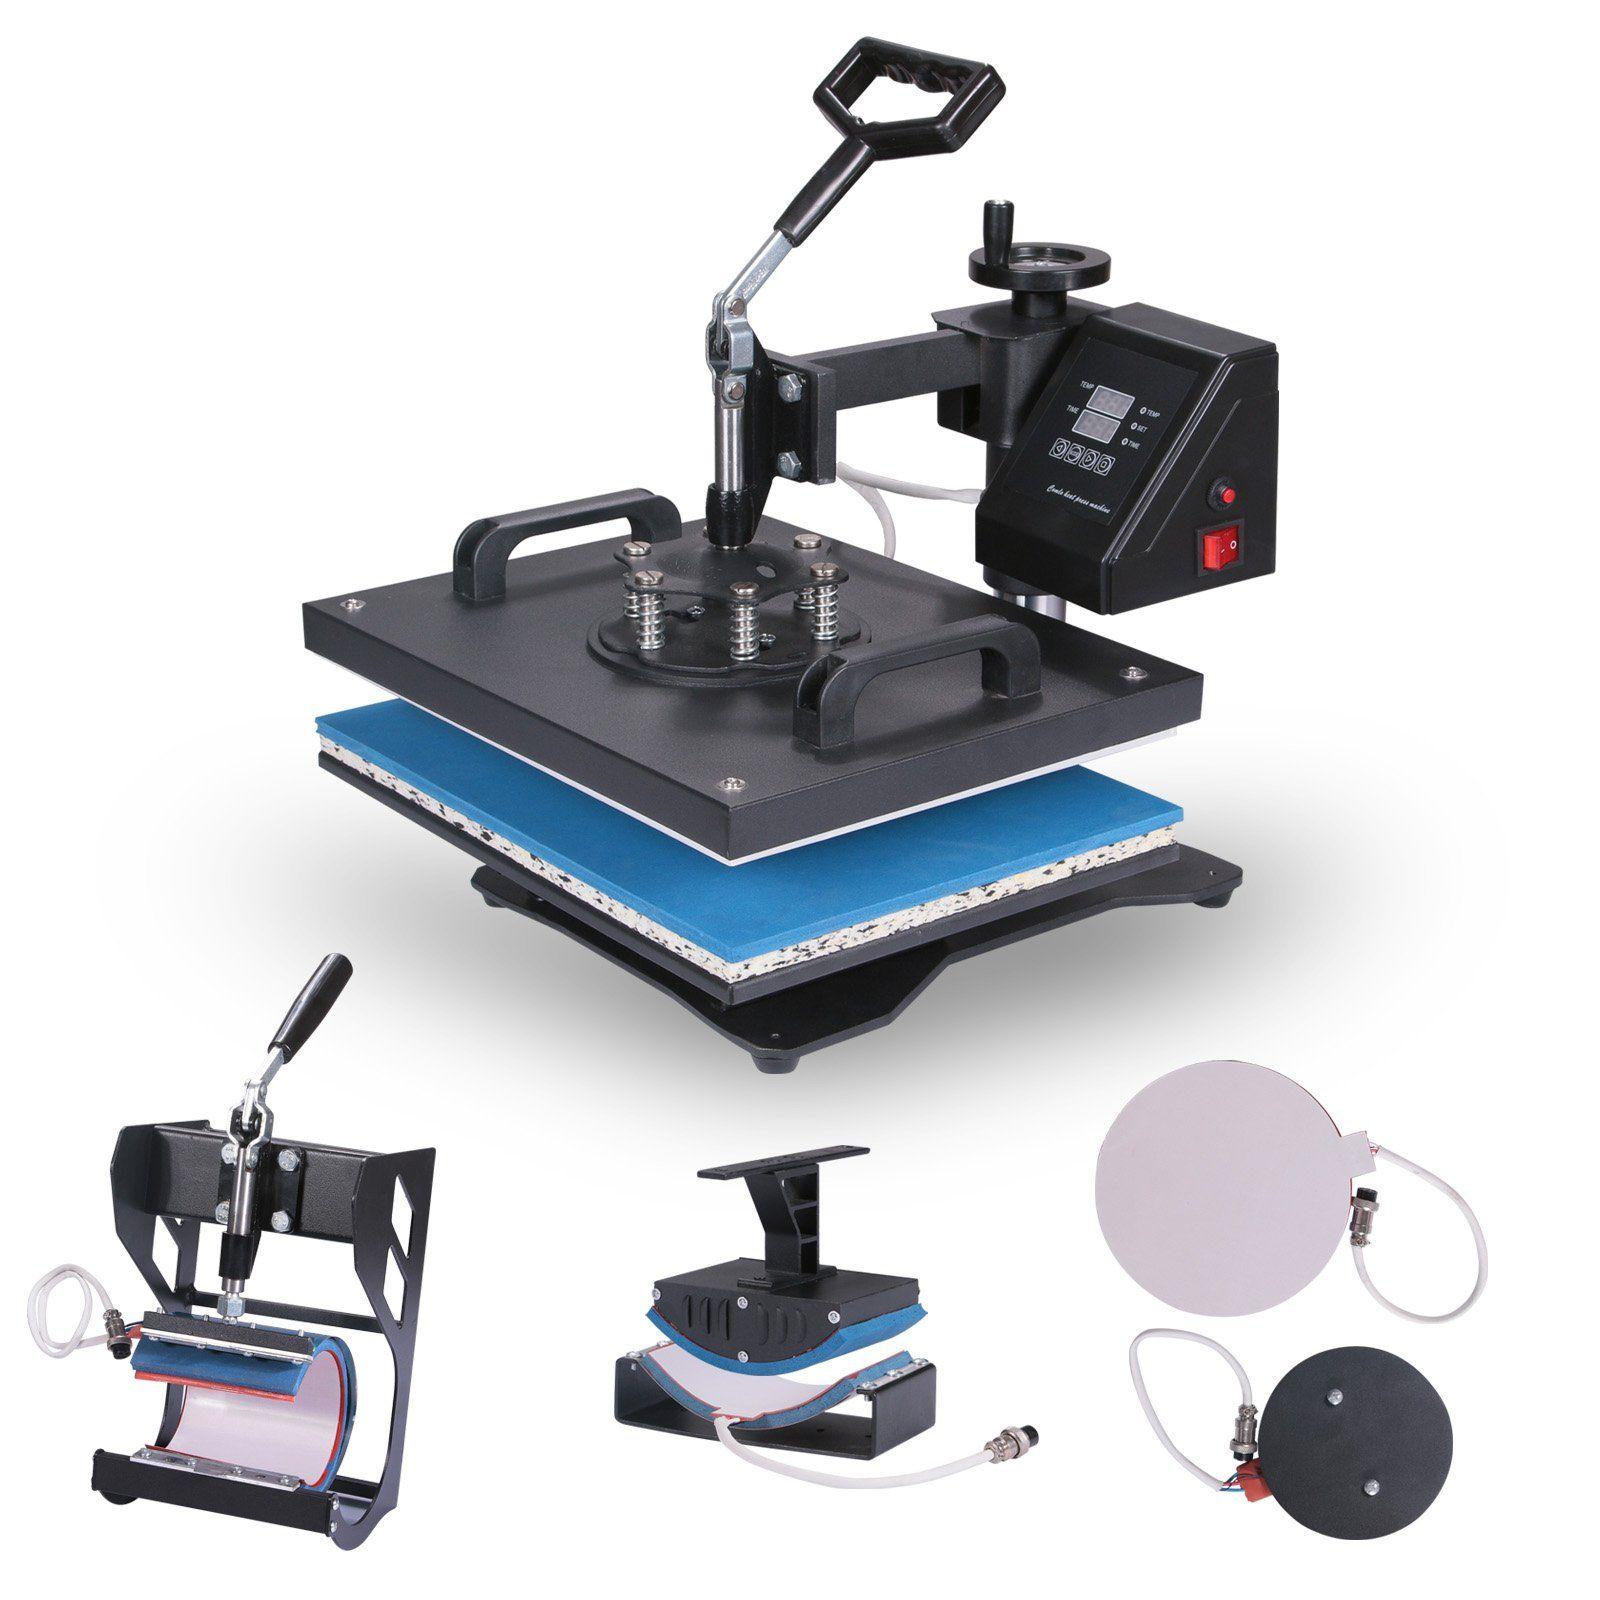 Vevor Heat Presses 12 X 15 Inch 5 In 1 Digital Multifunctional Sublimation T Shirt Heat Press Machine 1250w 360 Degree Rotation Heat Press Machine For T Shirts Best Heat